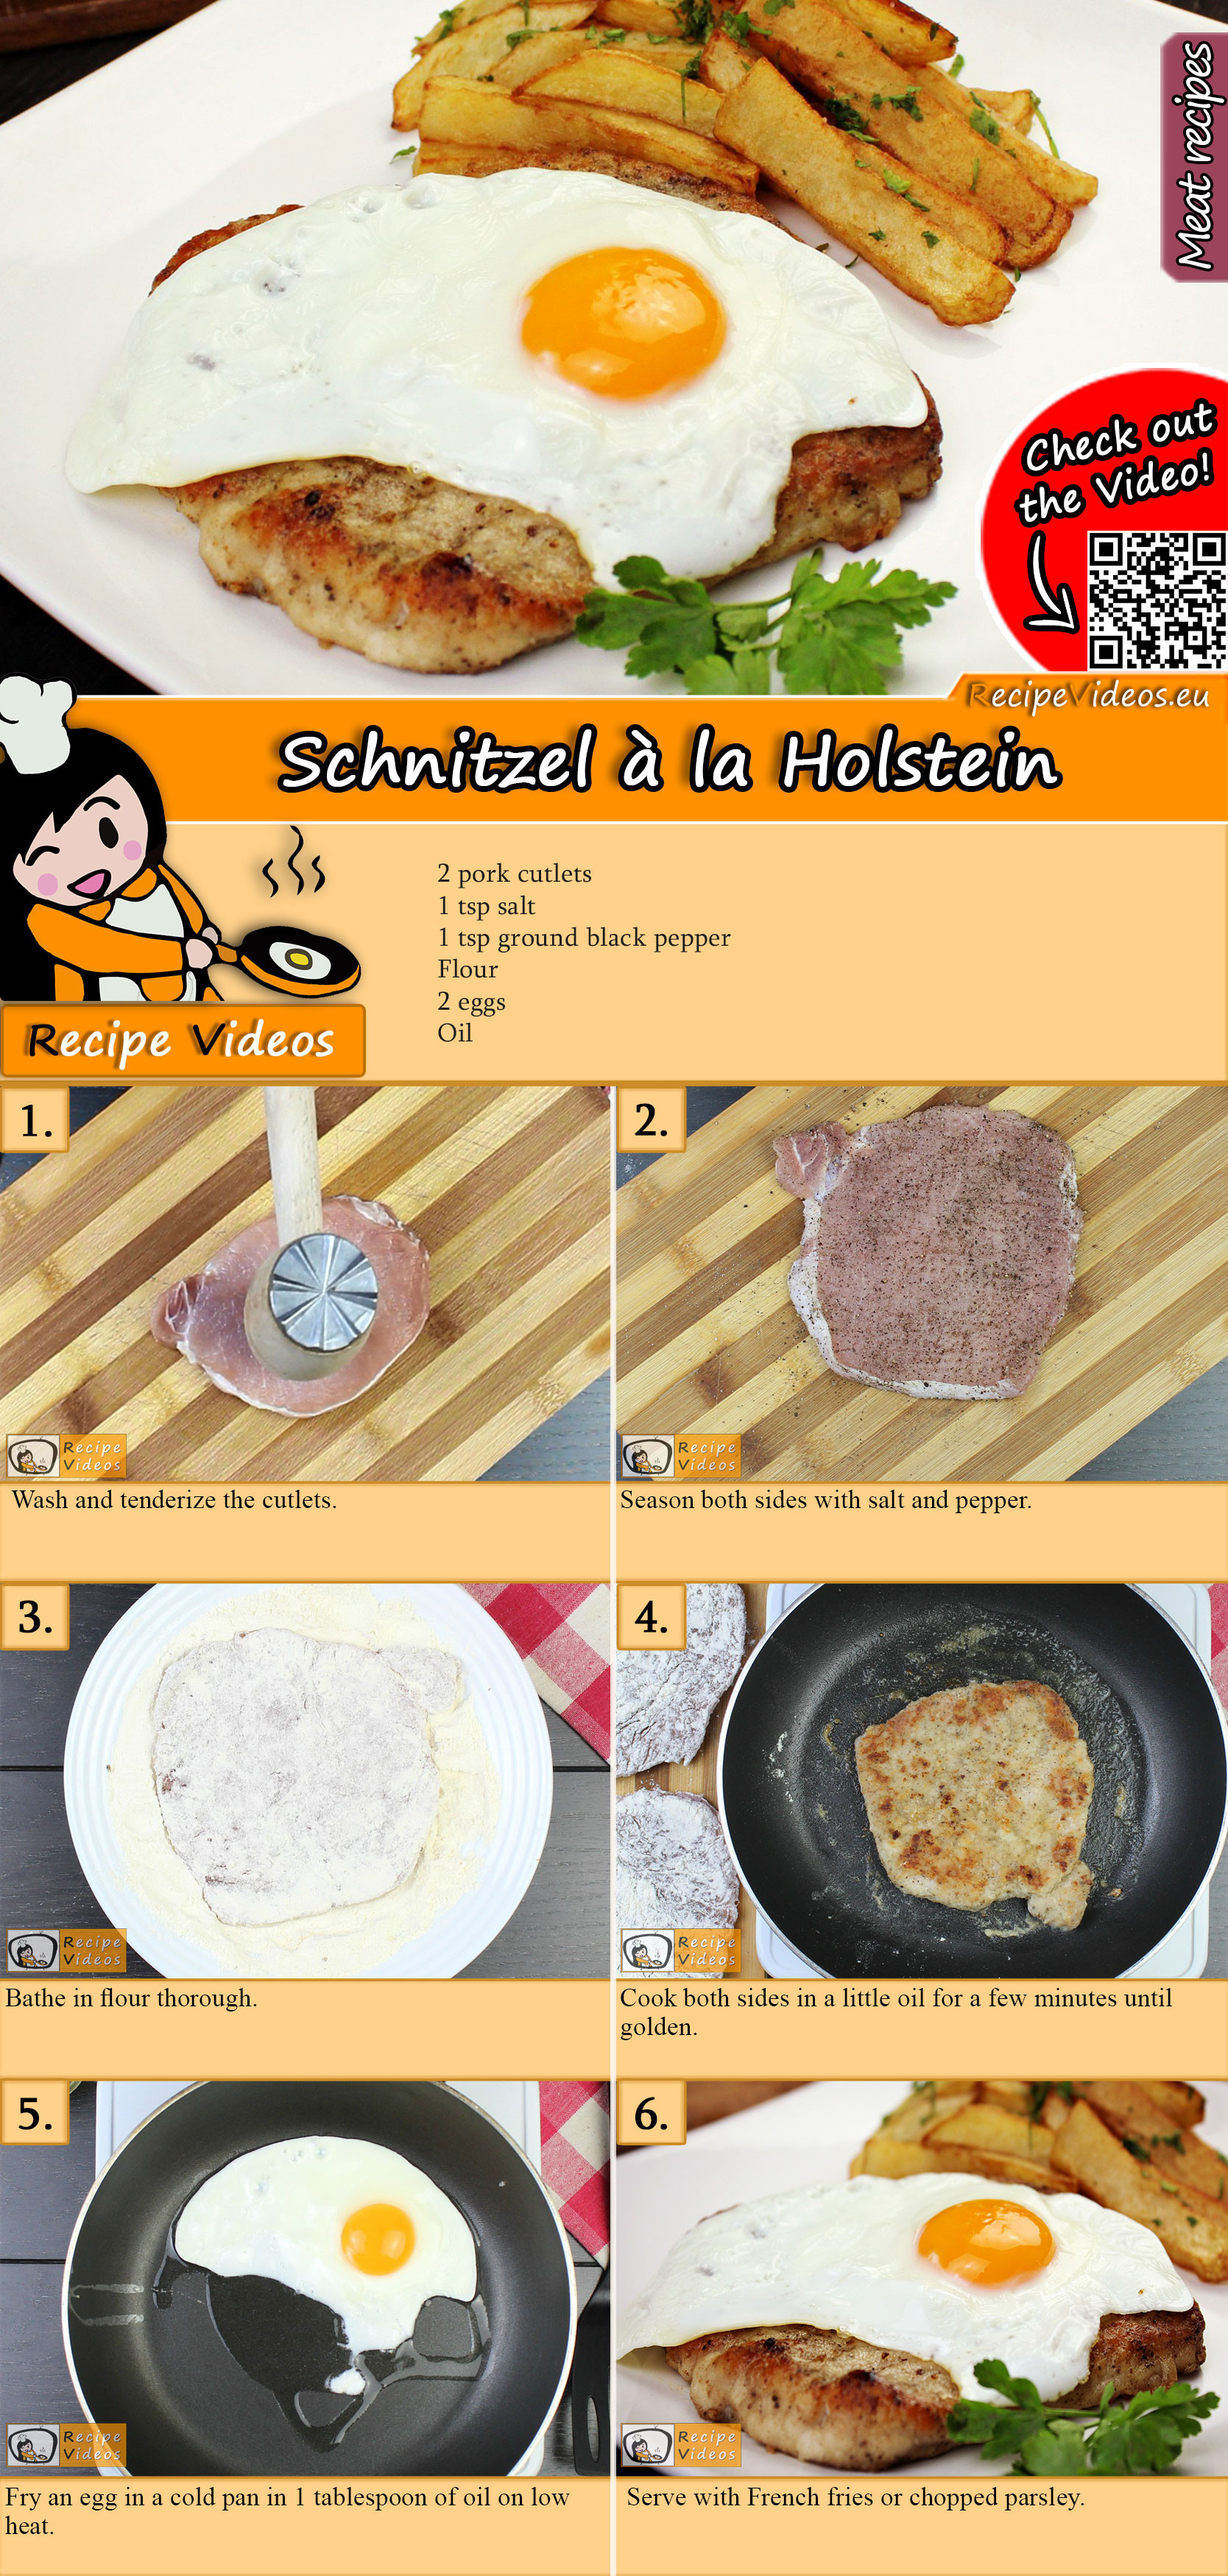 Schnitzel à la Holstein recipe with video